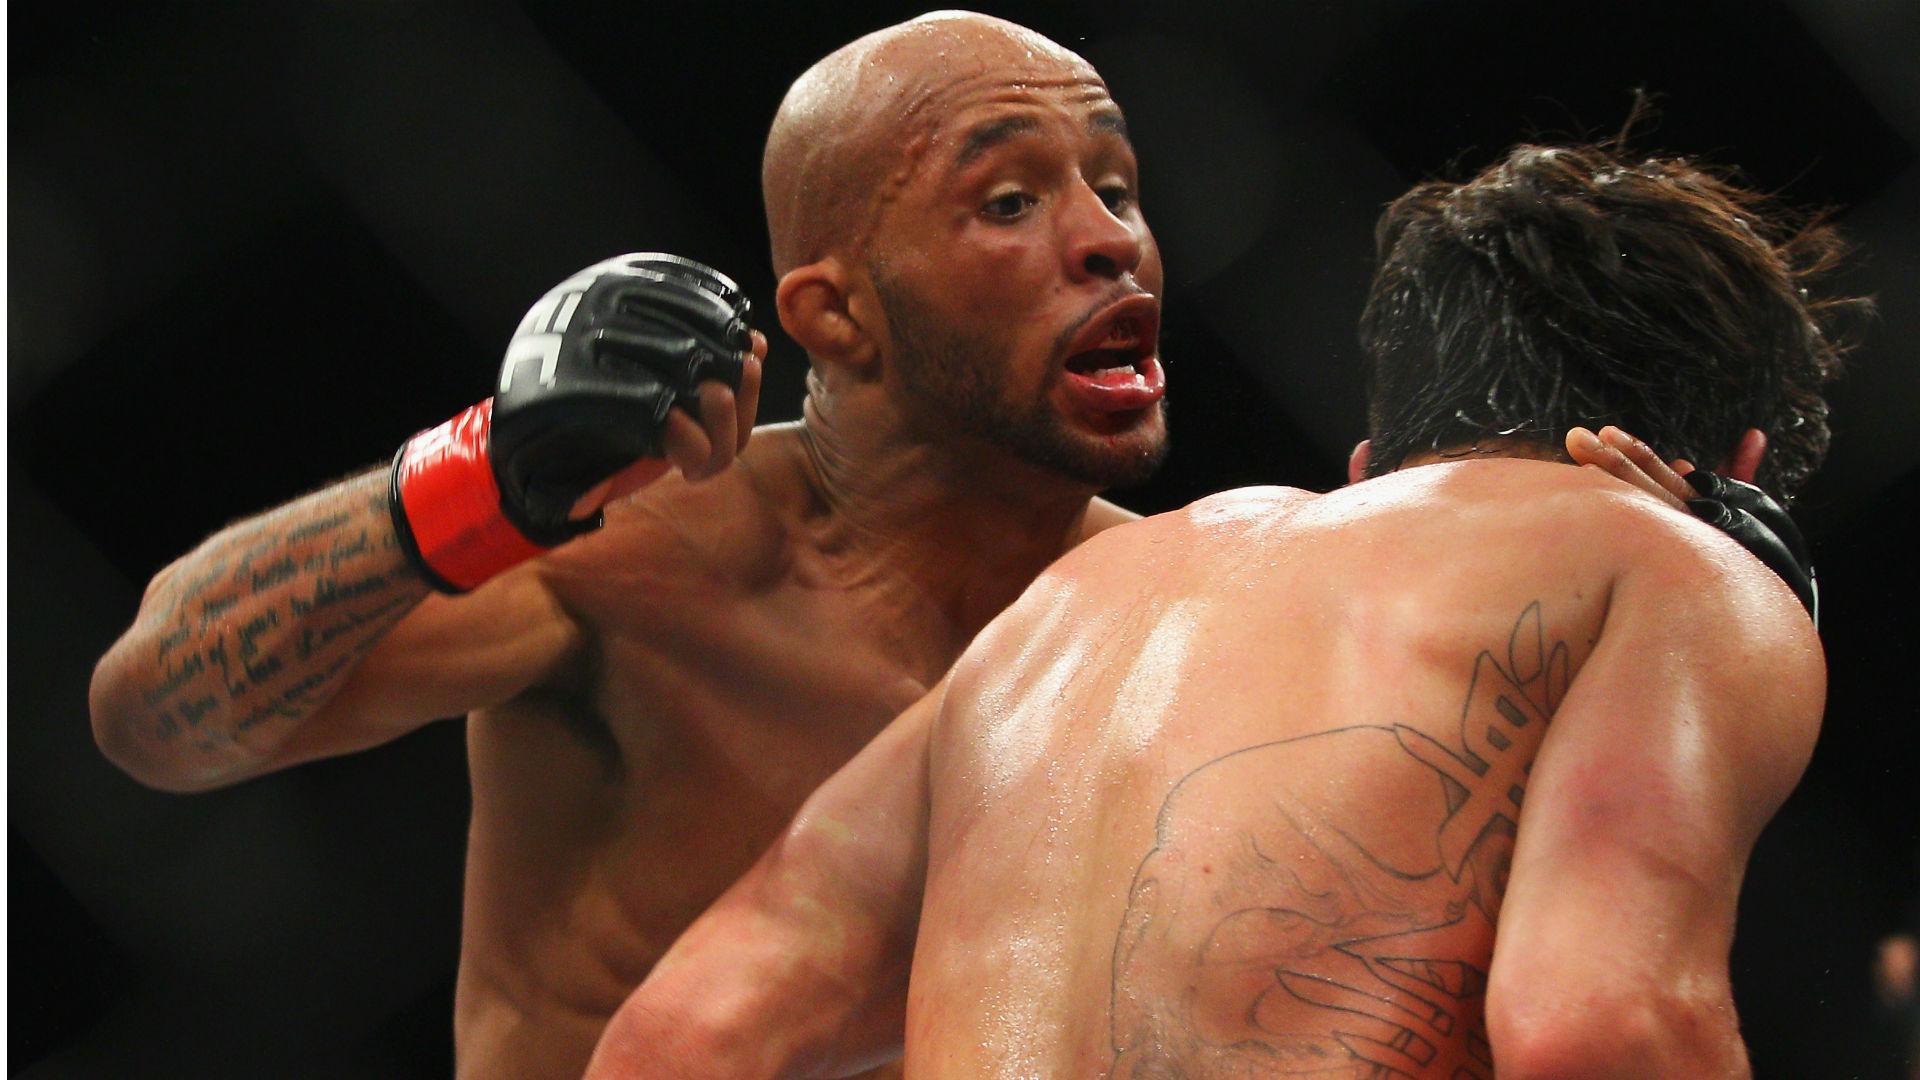 UFC 186 odds and picks – 'Mighty Mouse' Johnson the prohibitive favorite vs. Kyoji Horiguchi